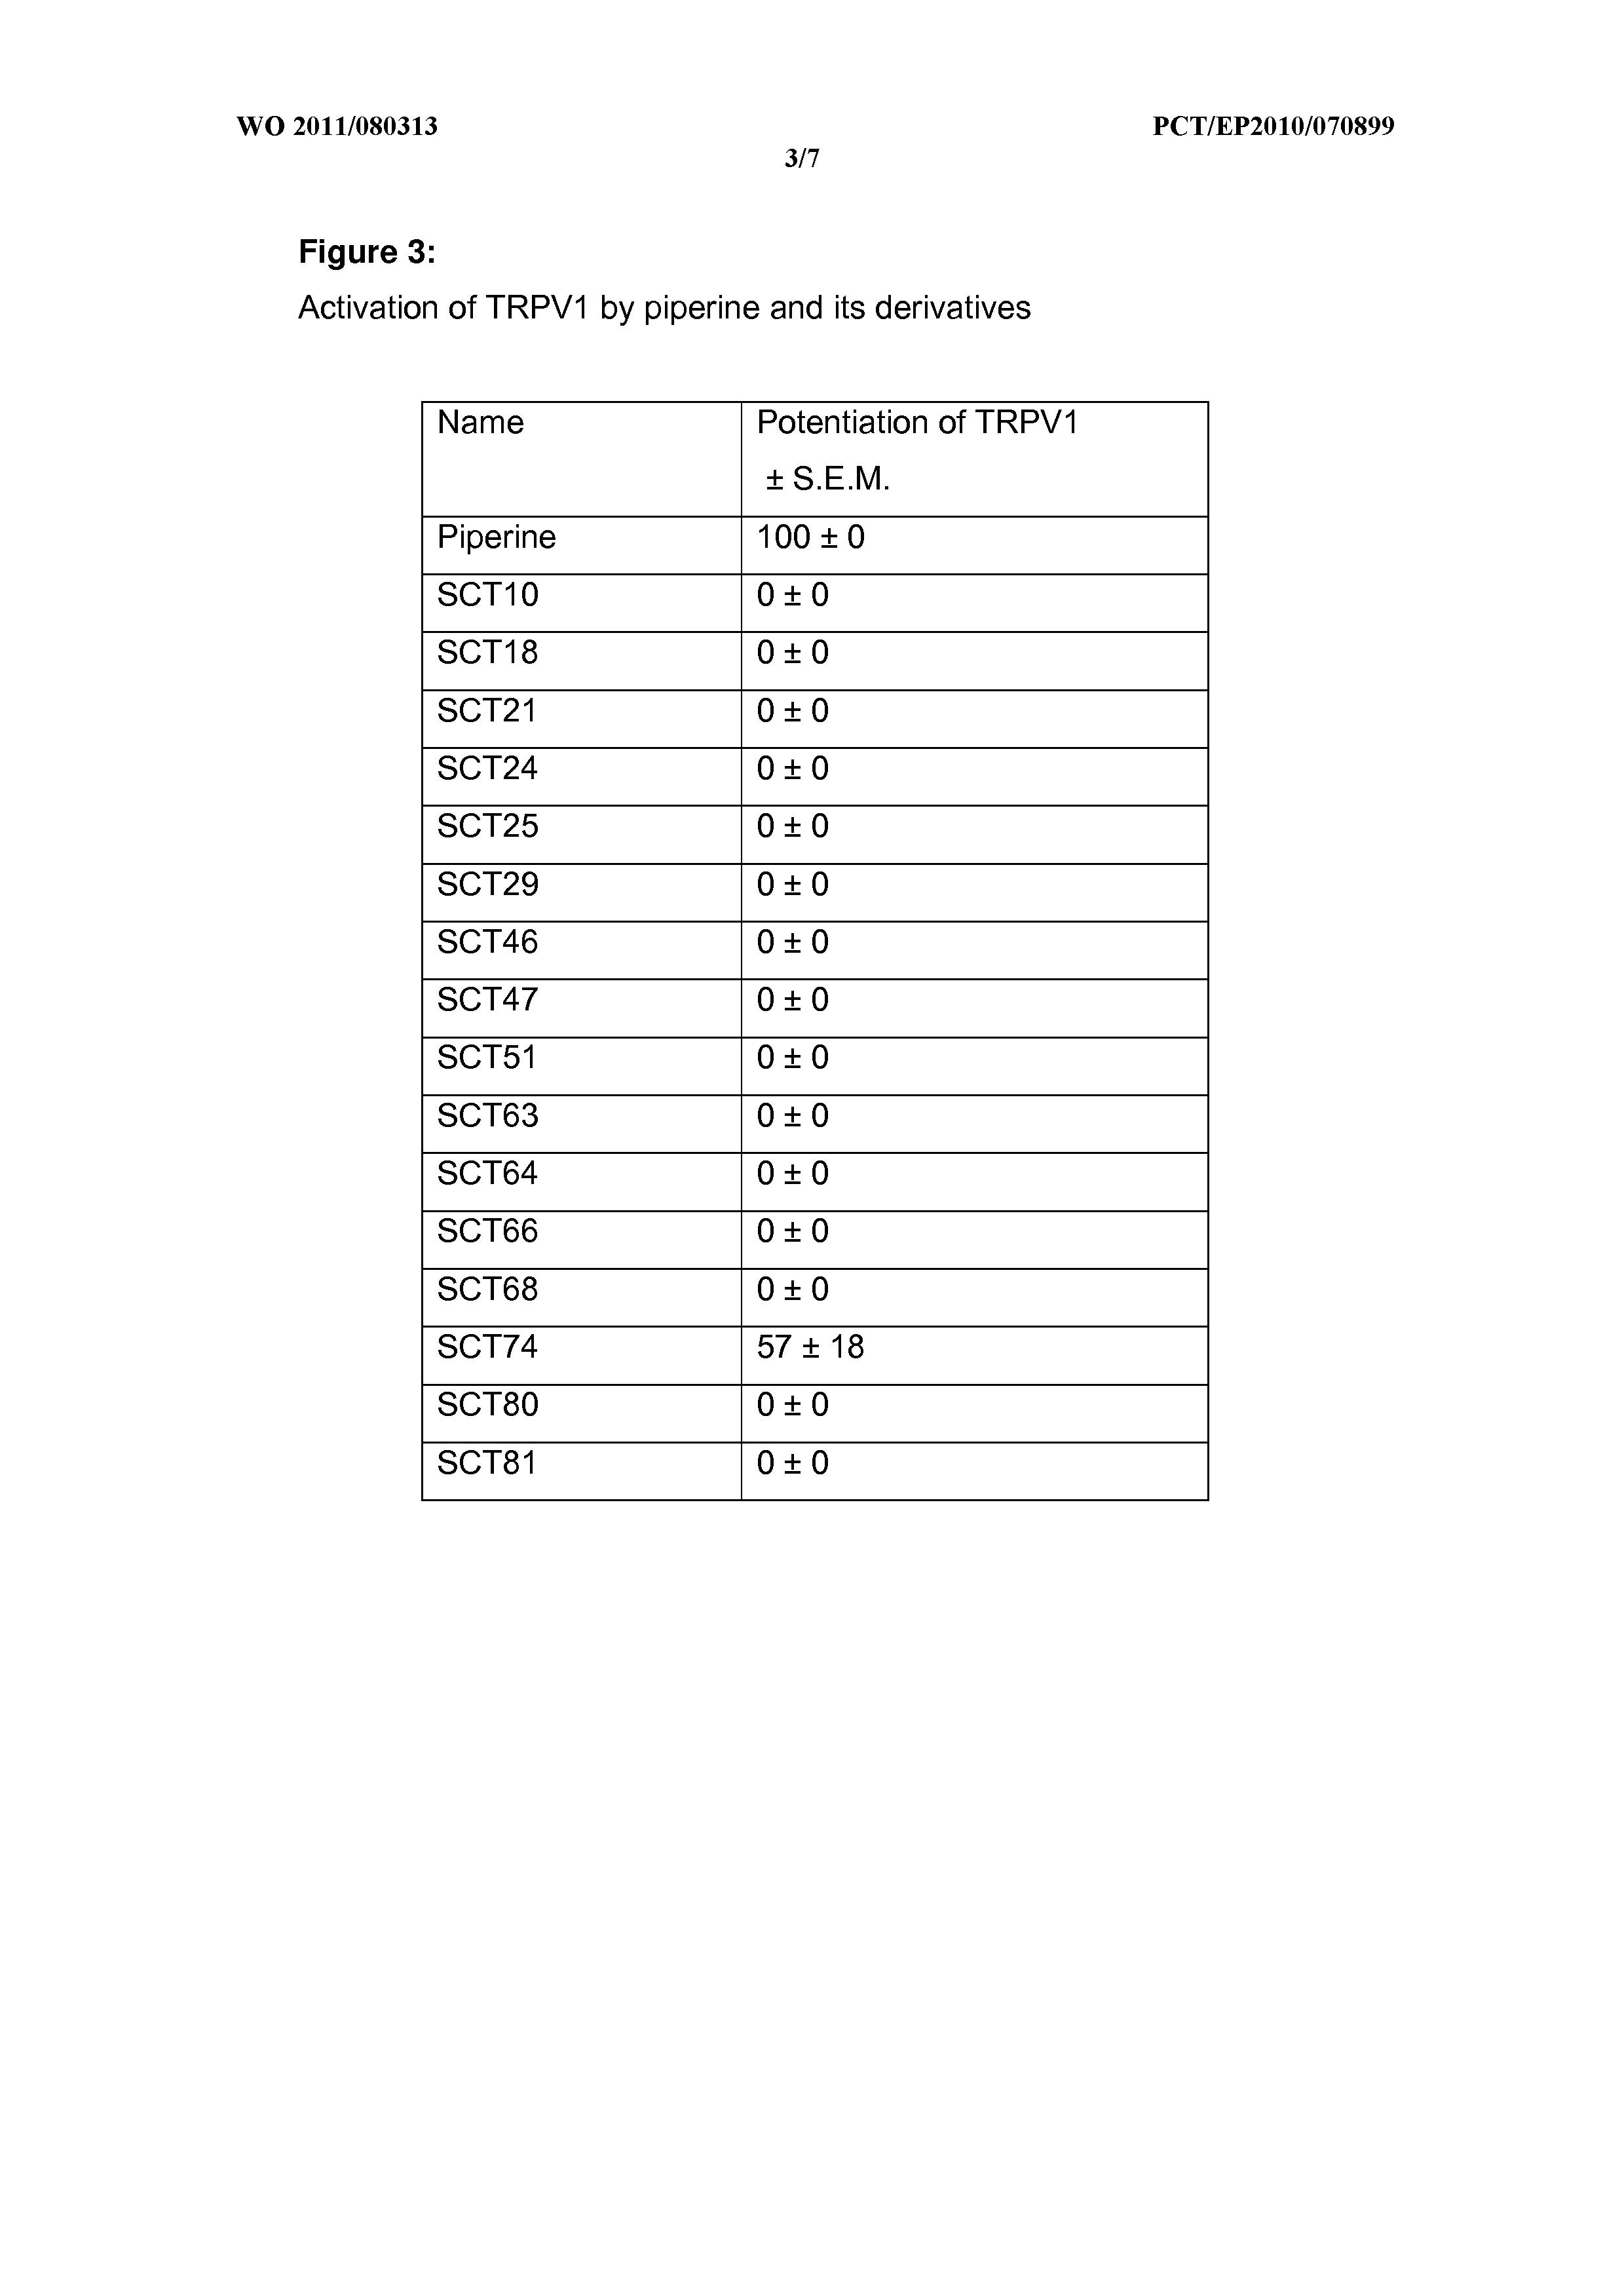 WO 2011/080313 A1 - Novel Piperine Derivatives As Gaba - A Receptors